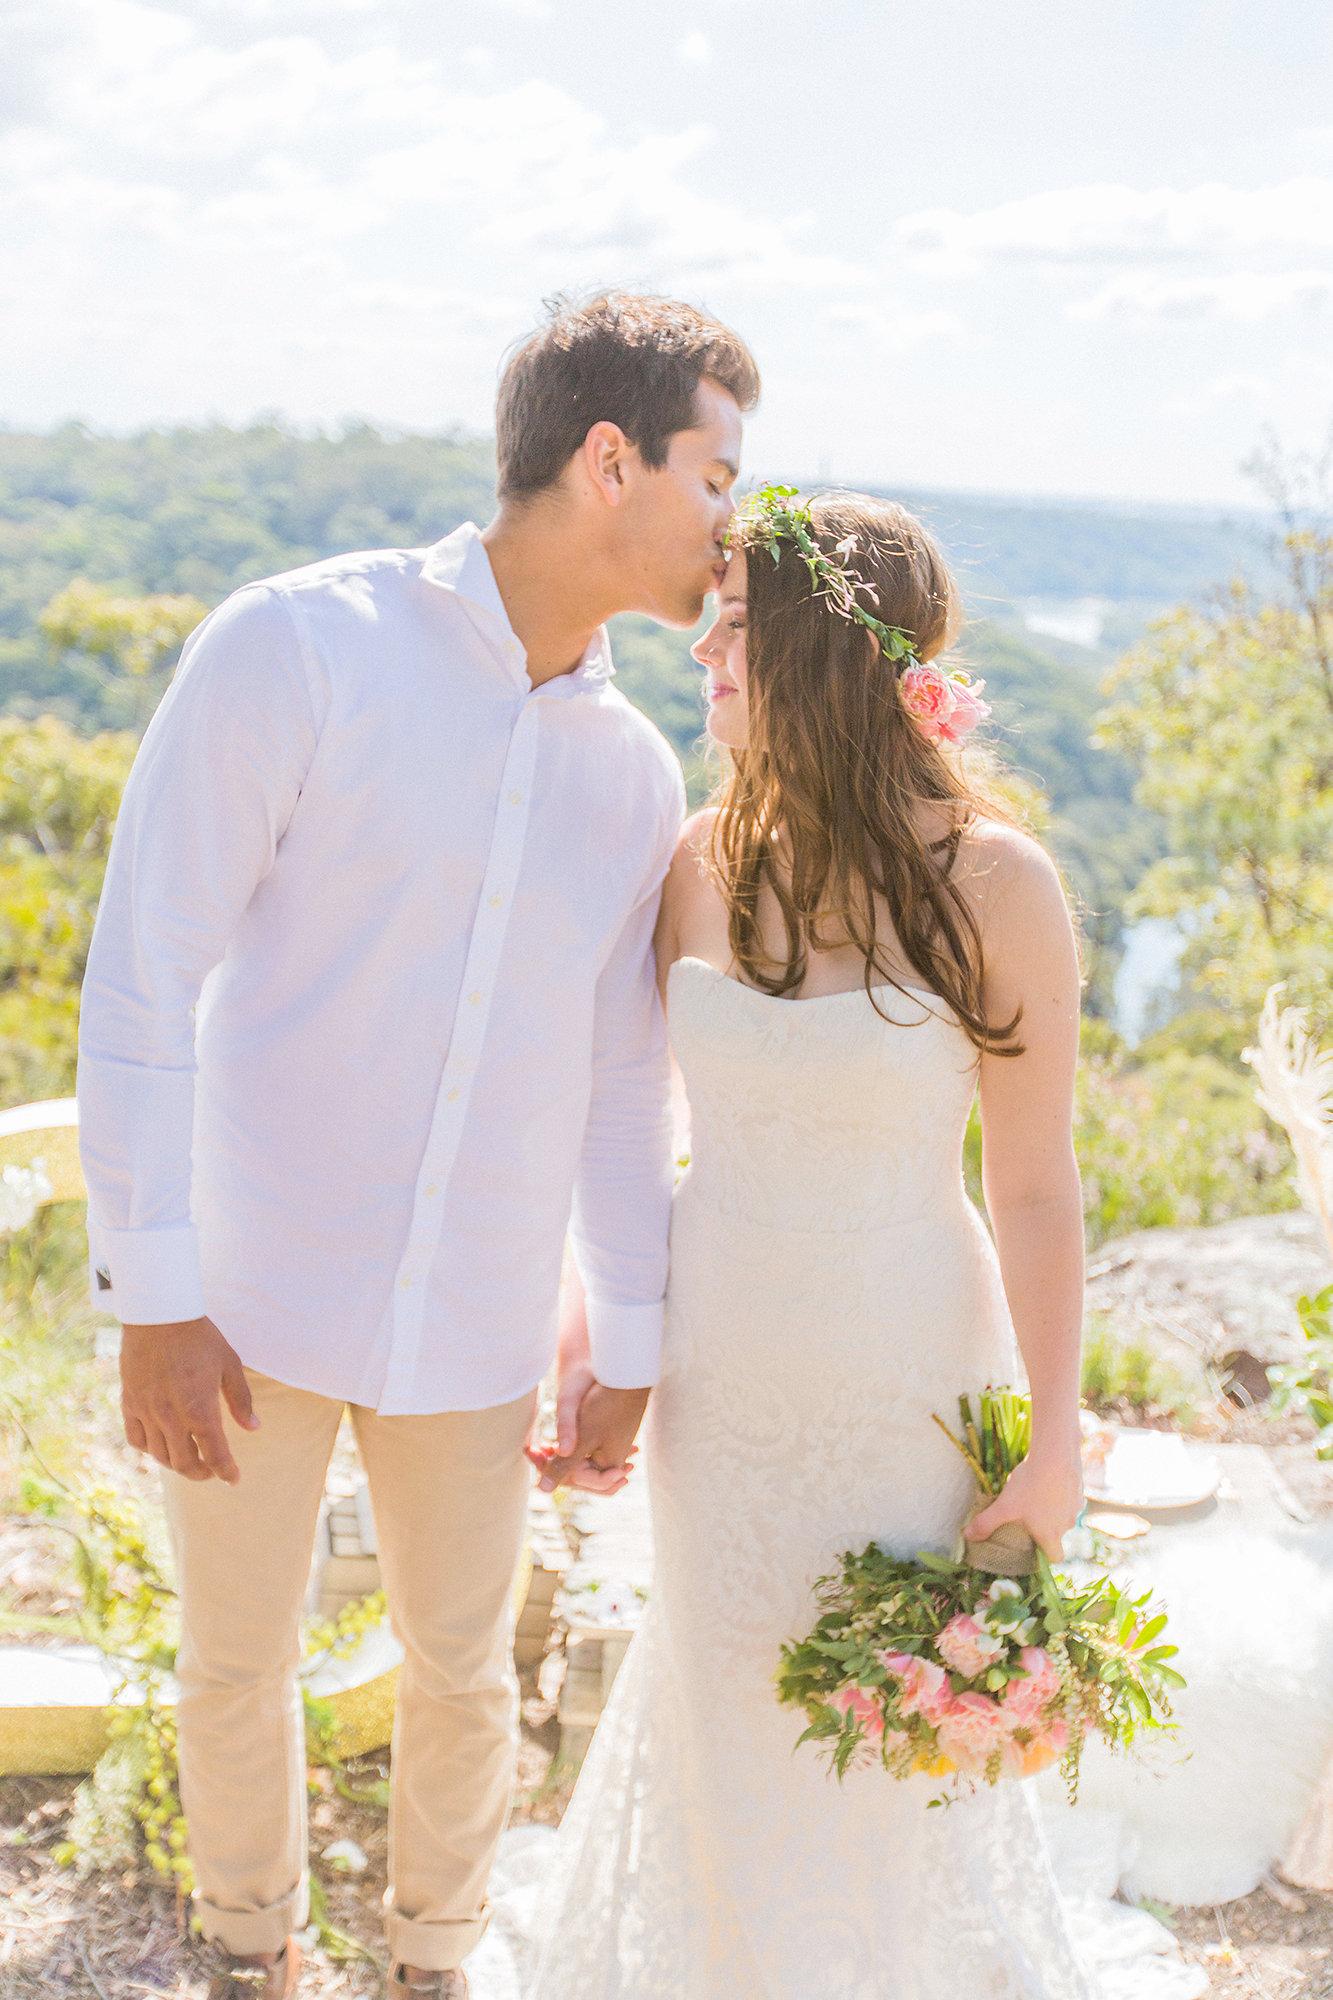 3lyric gown tanya anic bridal photography lilelements modern wedding feature blog 3E3A0512.jpg